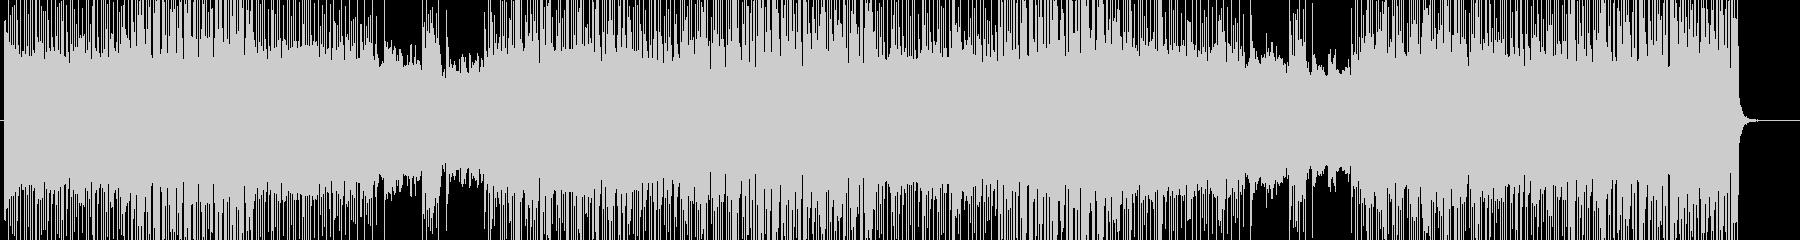 「HR/HM」「DARK」BGM202の未再生の波形